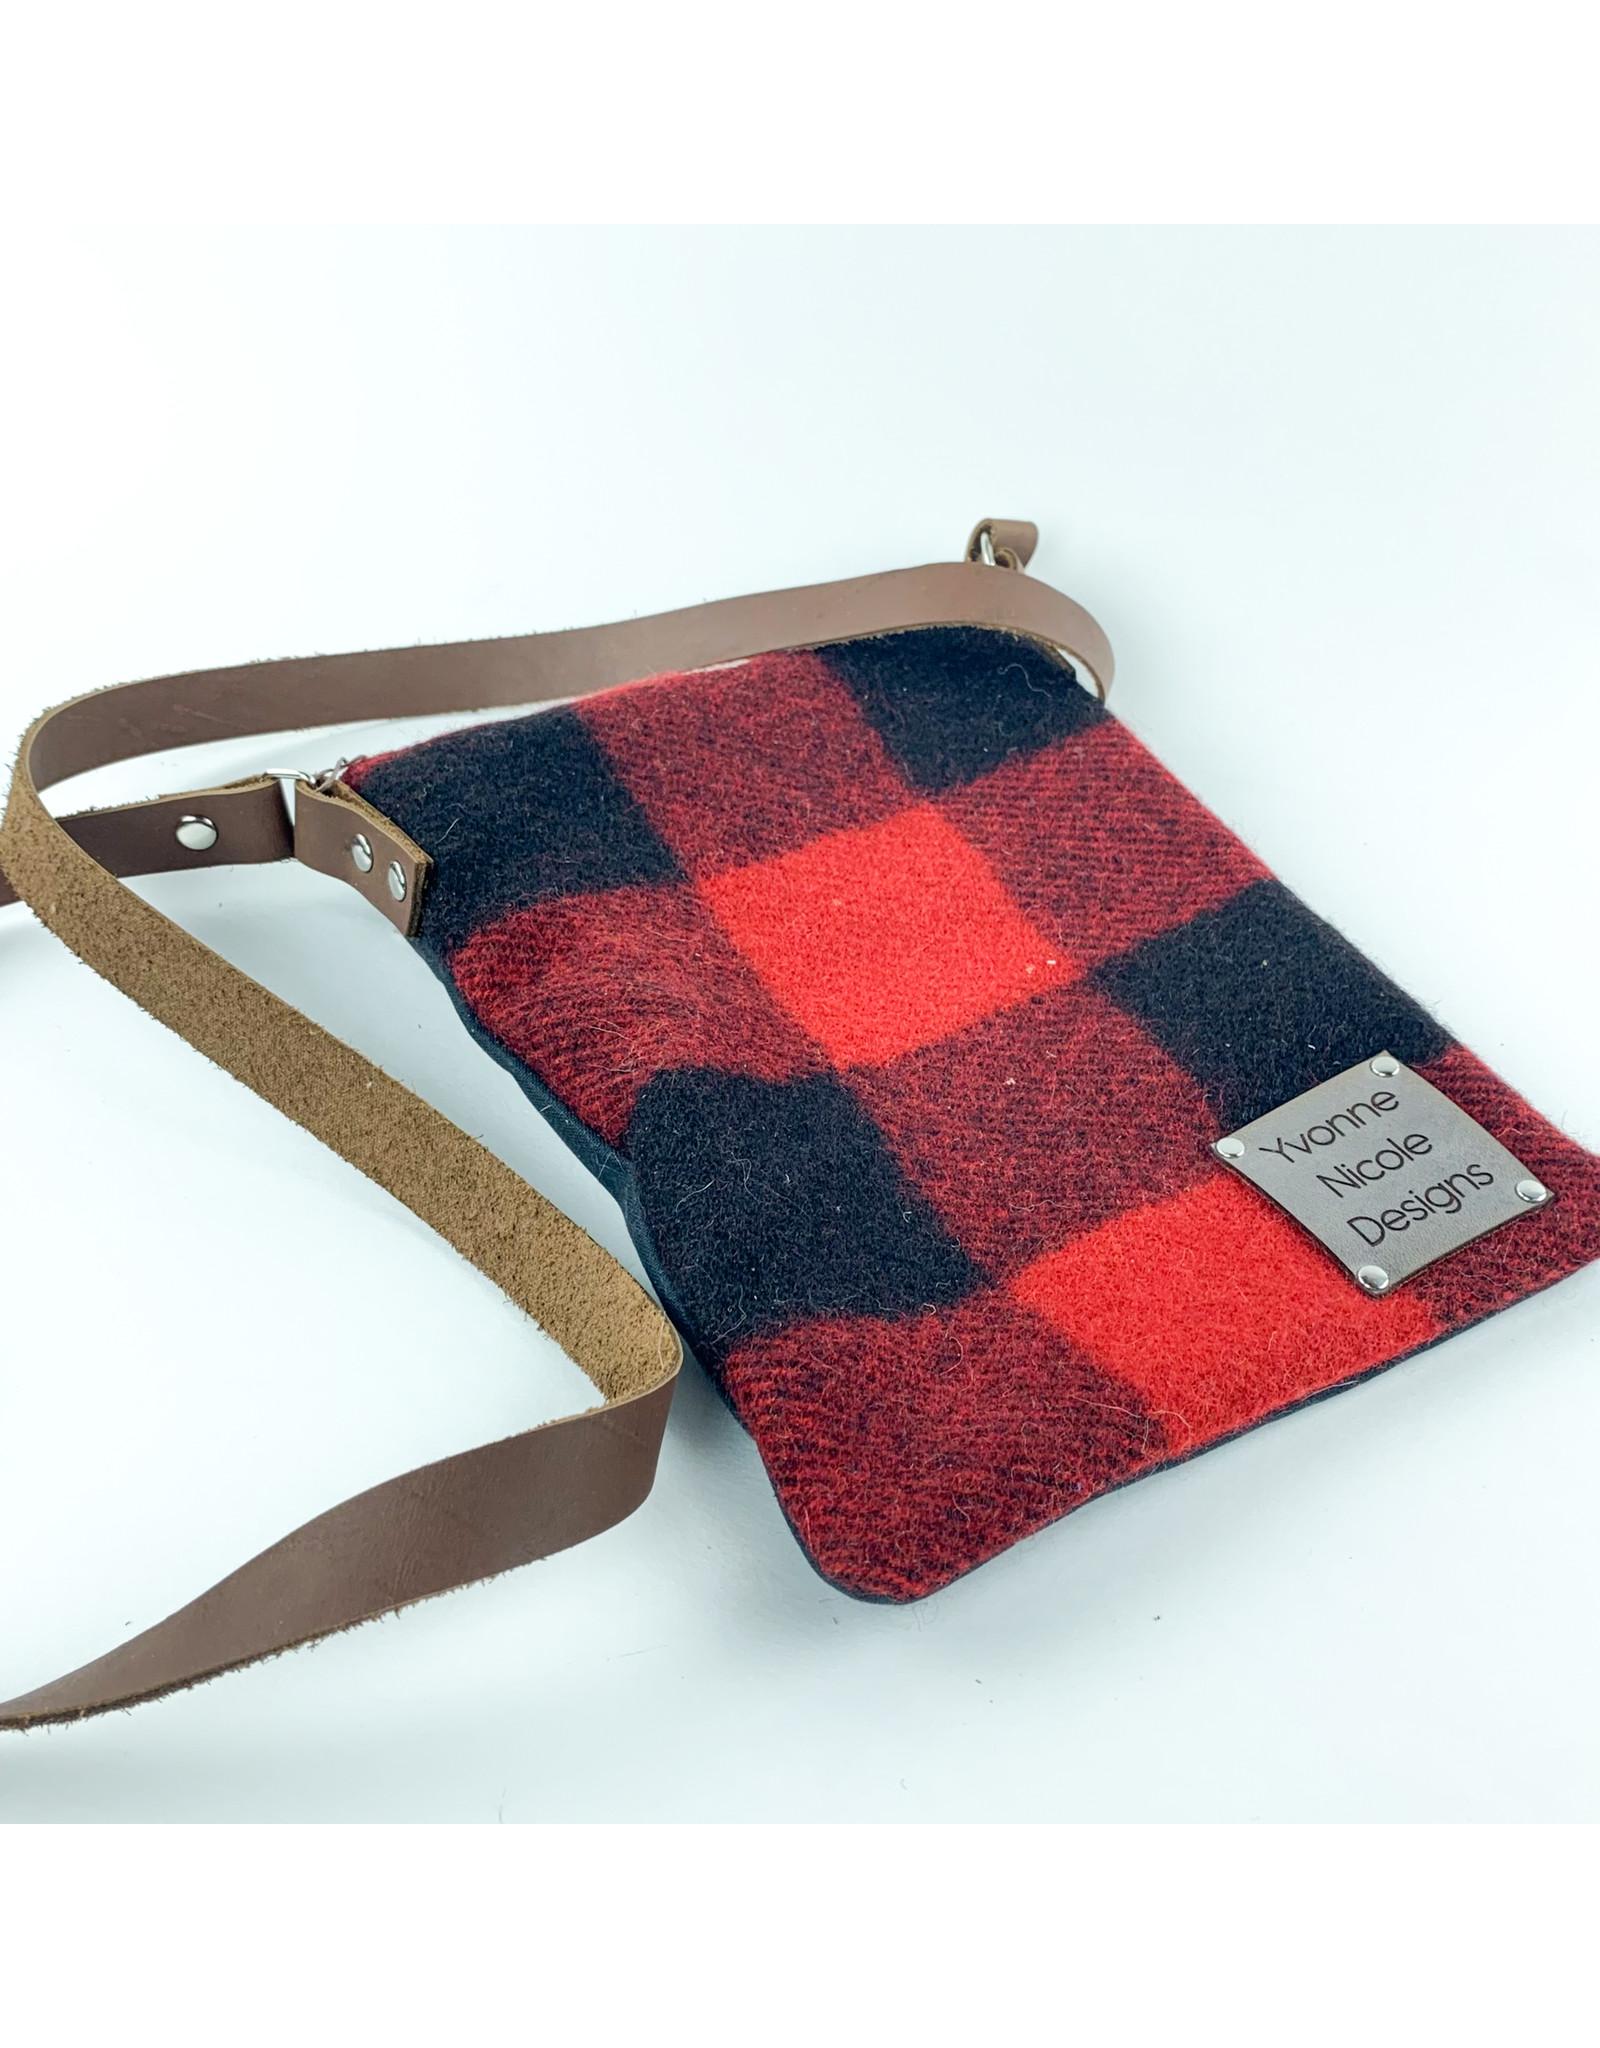 Yvonne Nicole Designs Flat Wool Crossbody Plaid Consignment